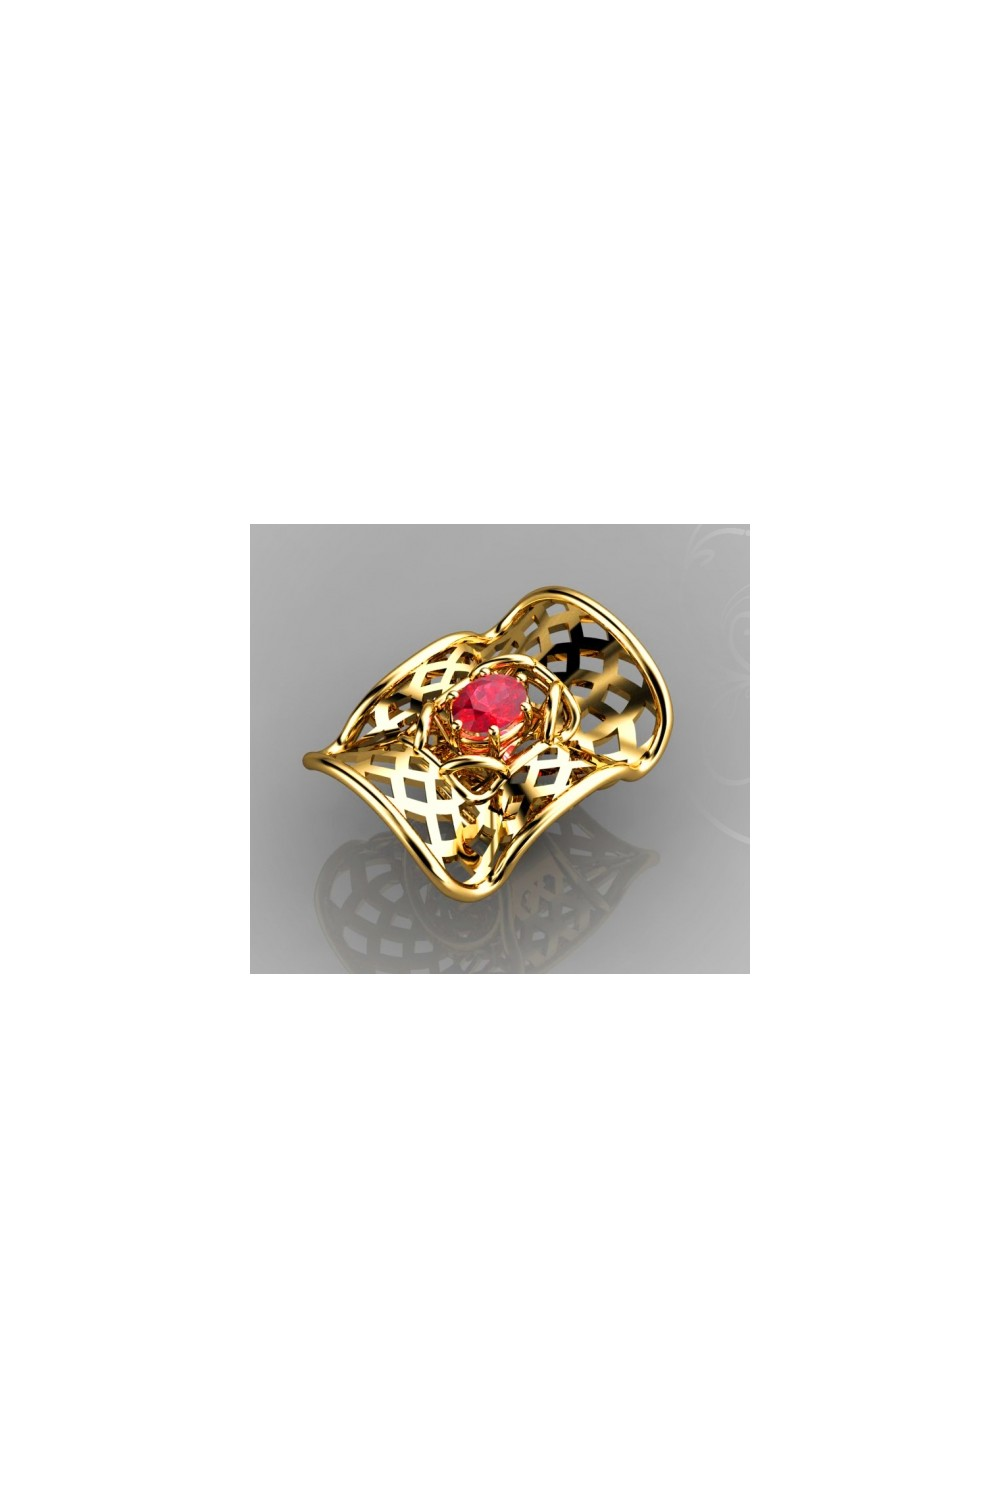 18k Gold Oval Shaped Ruby Gemstone Ring